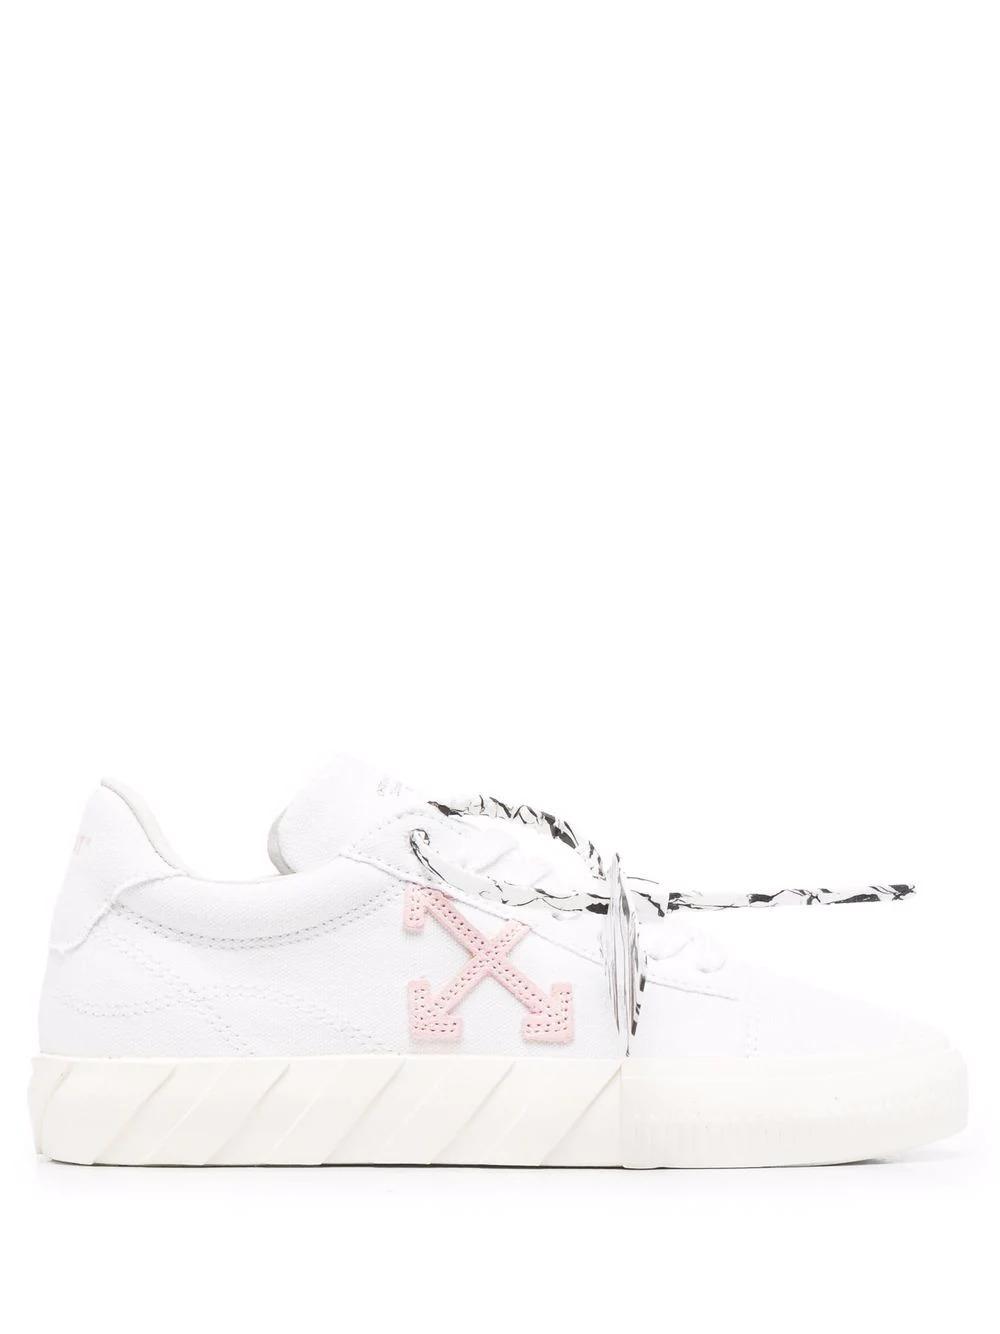 Low-Top Vulcanized Sneakers in Weiß